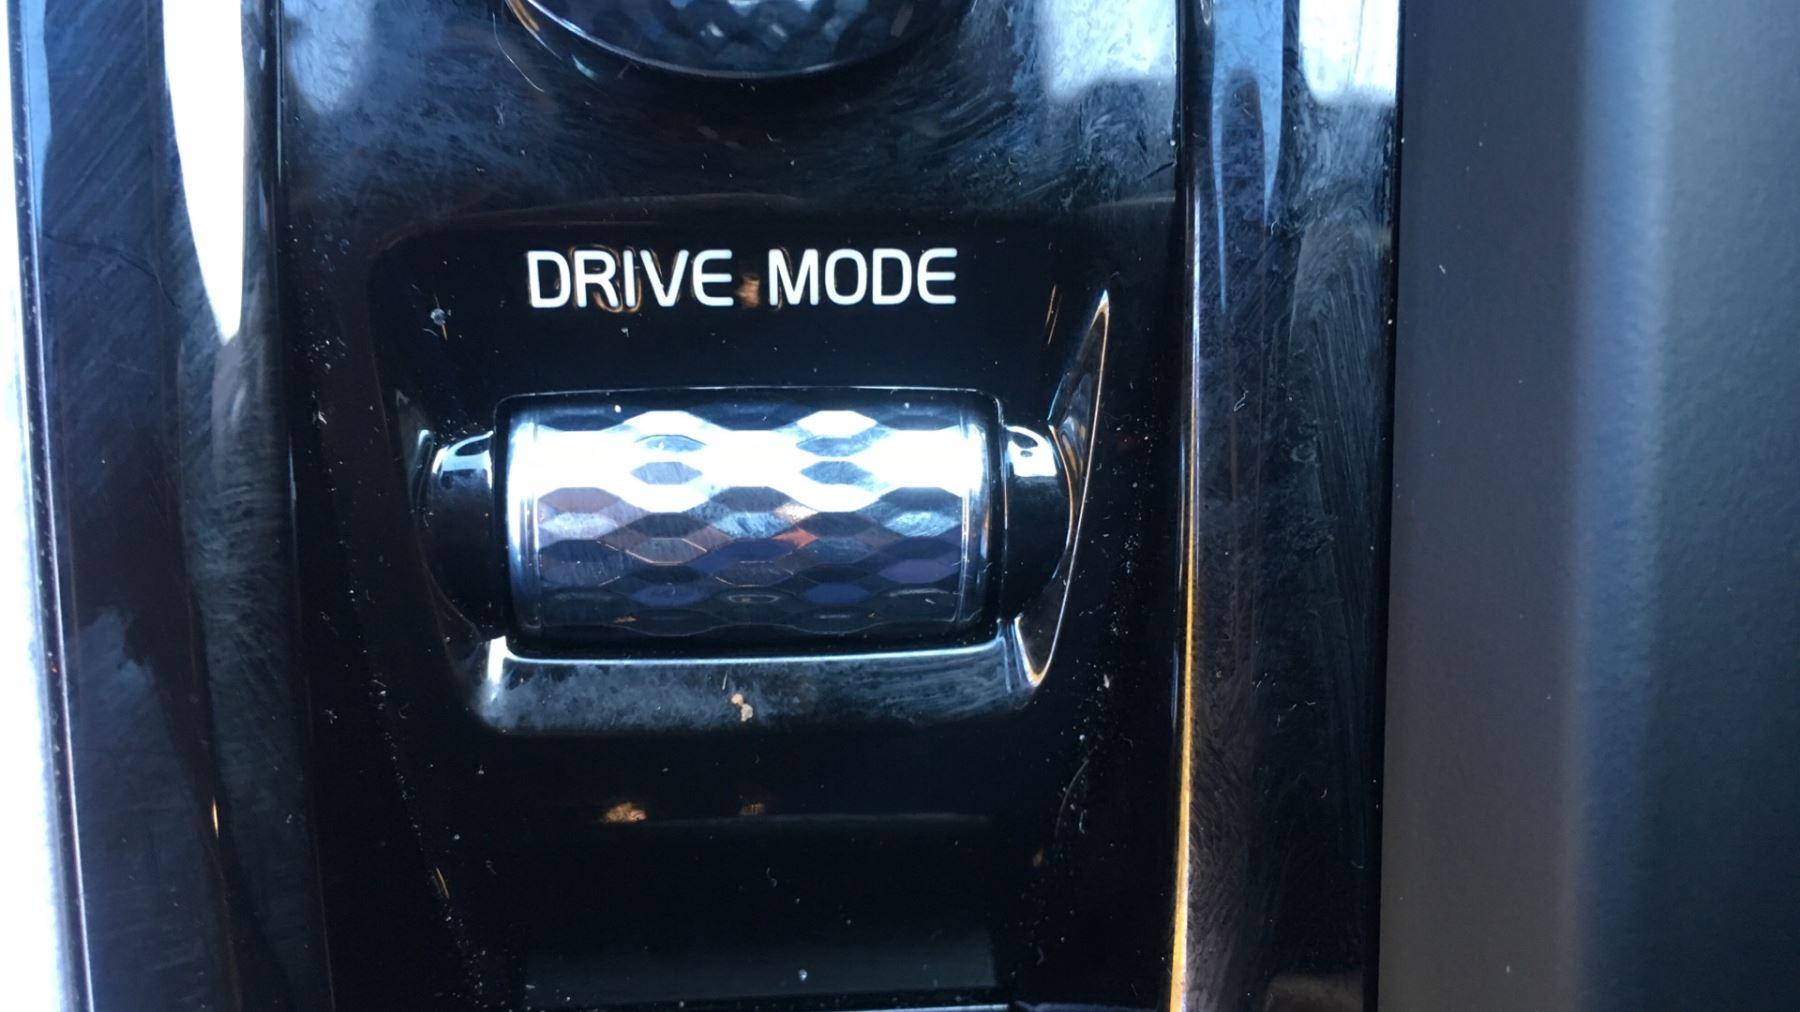 Volvo V60 2.0 D4 [190] R DESIGN 5dr - Volvo on Call, DAB Radio, SAT NAV, Park Assist image 29